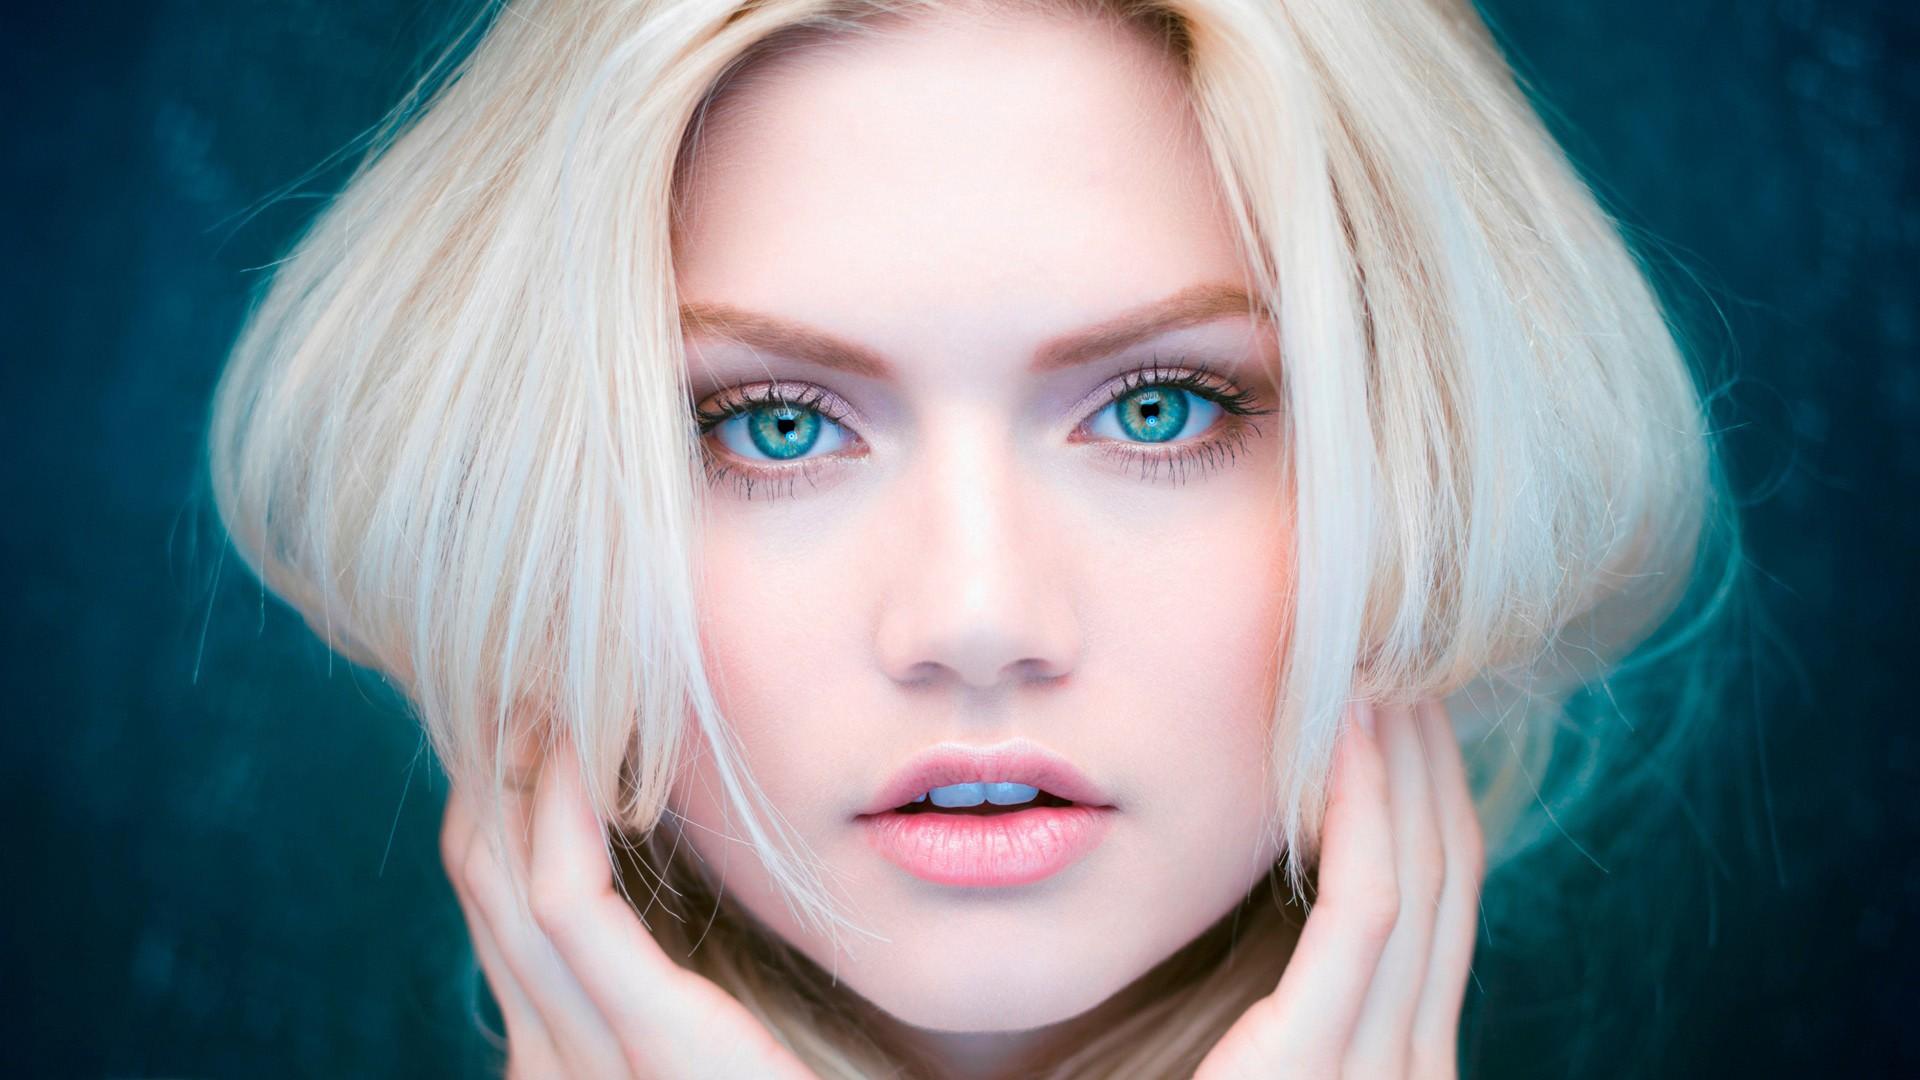 Wallpaper Face Women Model Blonde Blue Eyes Red Martina